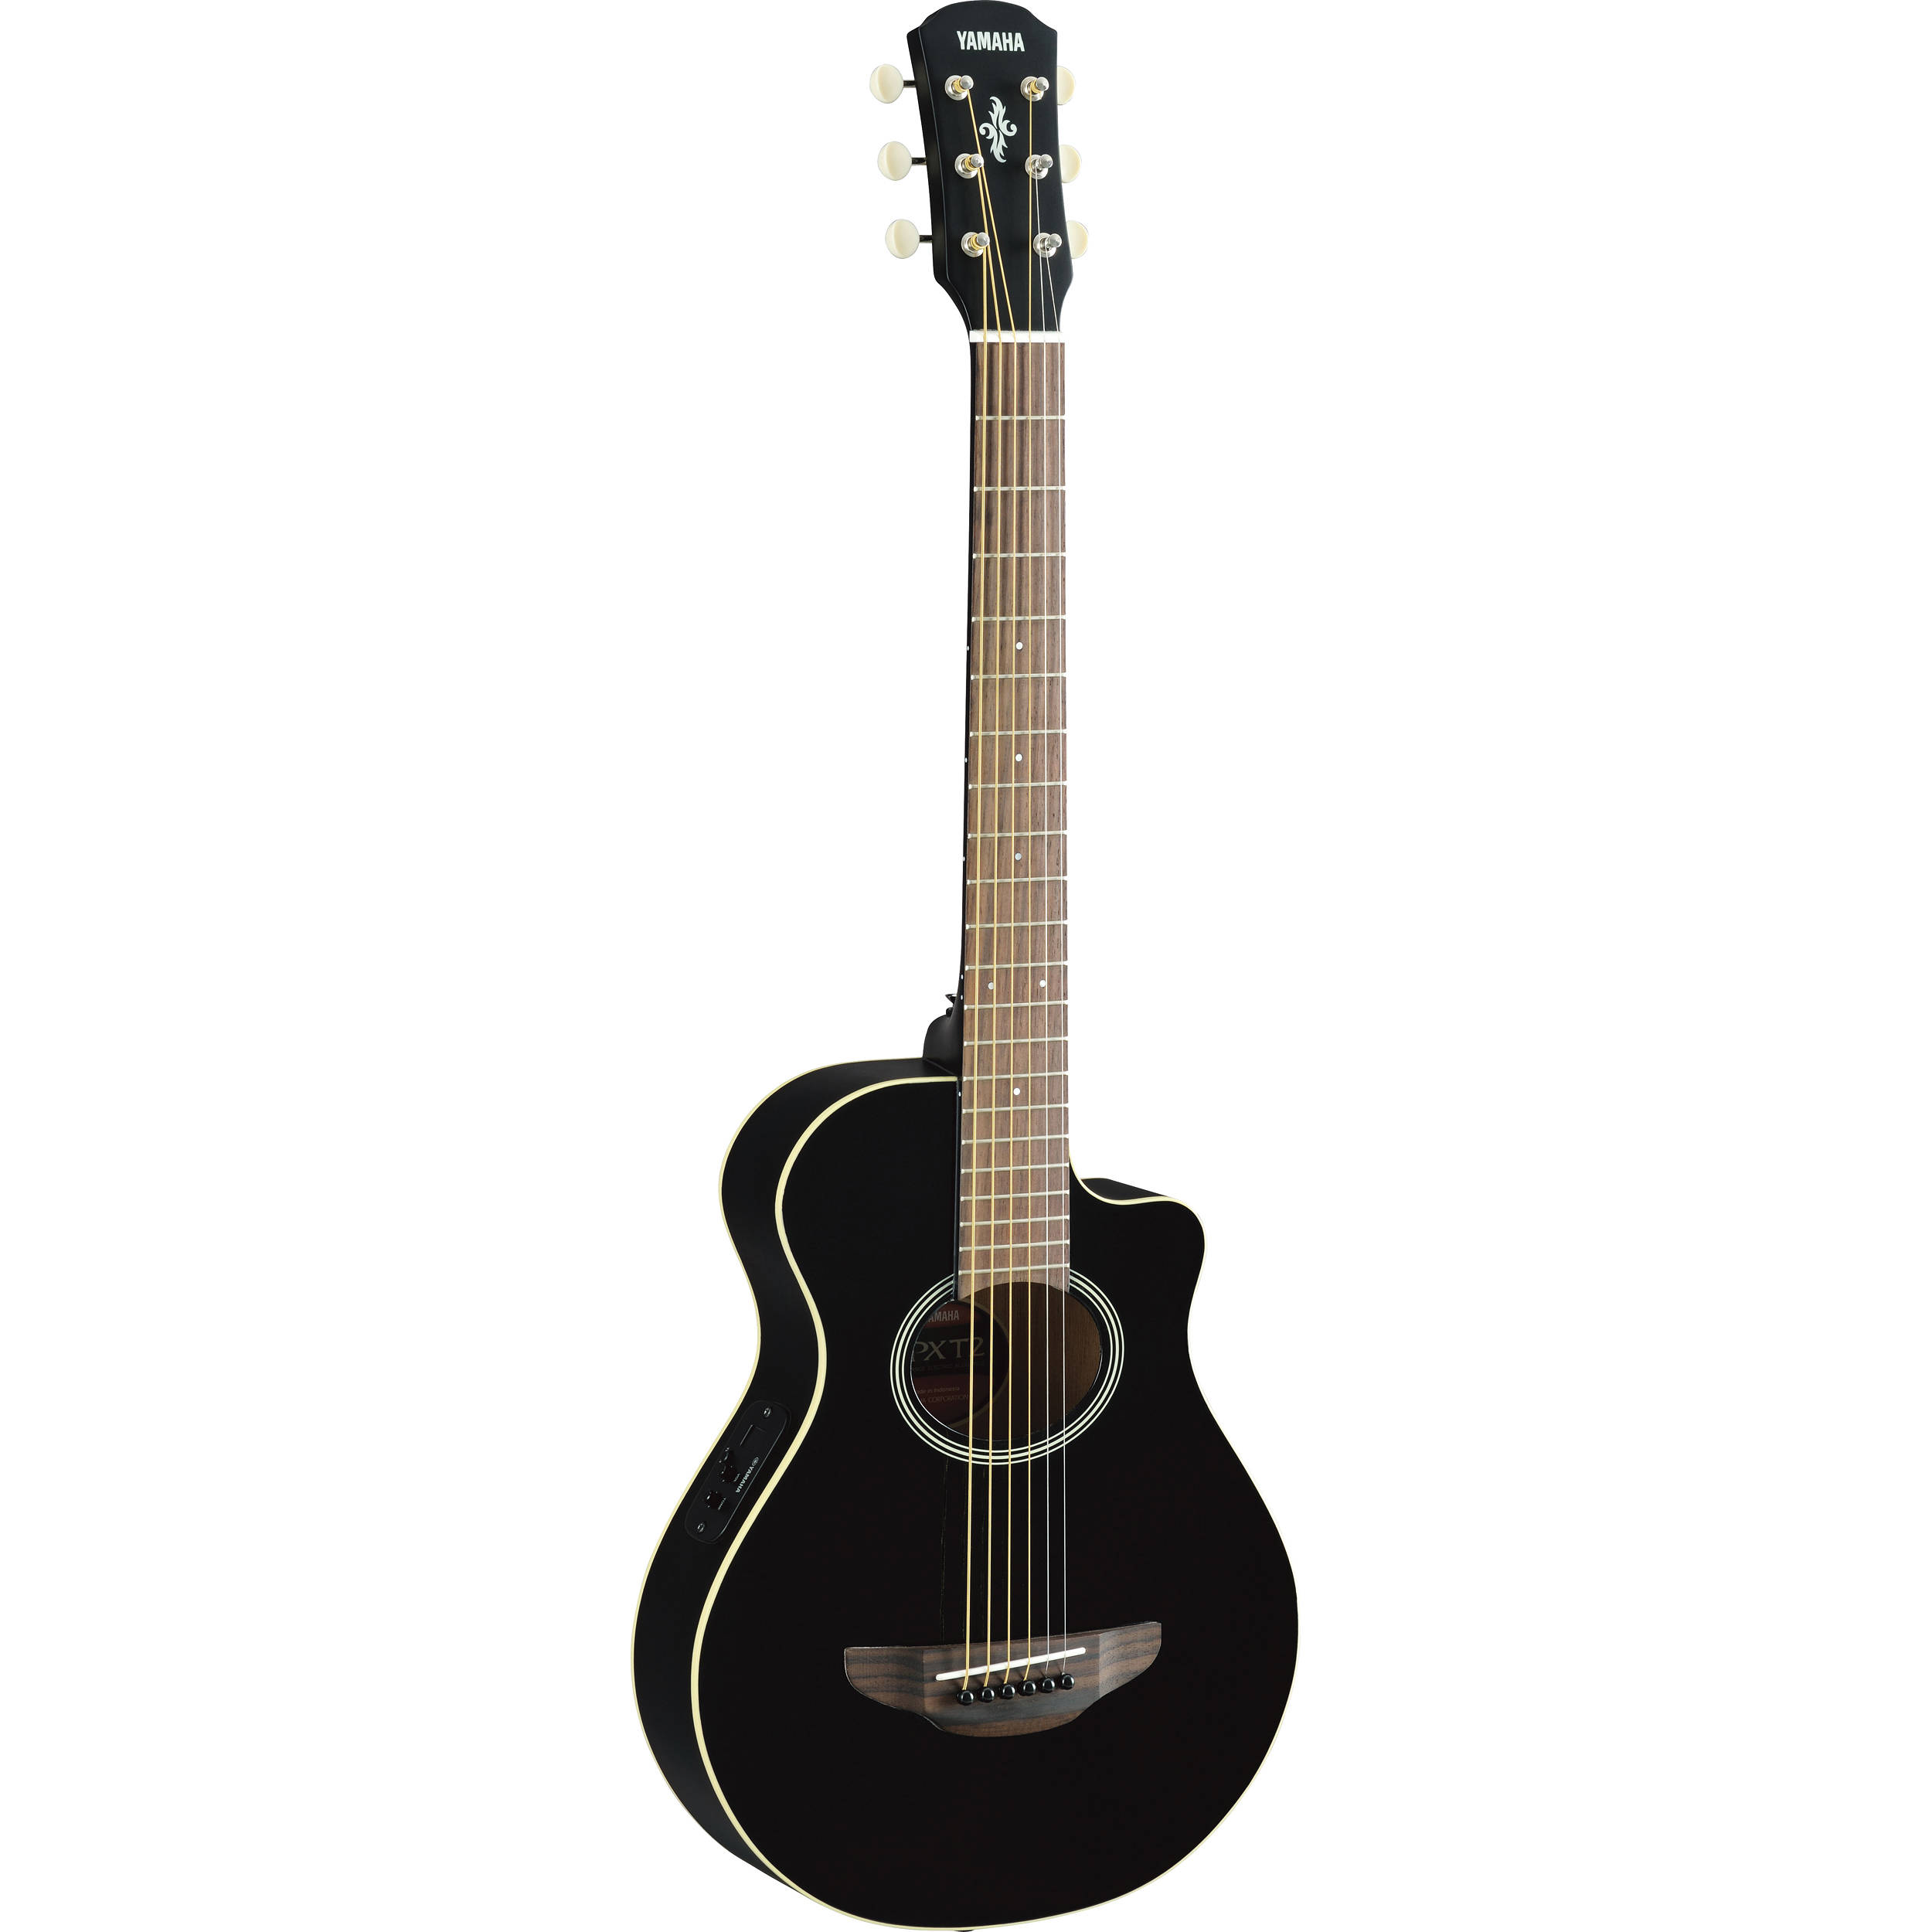 Yamaha APXT2 BL 3/4 Acoustic Electric